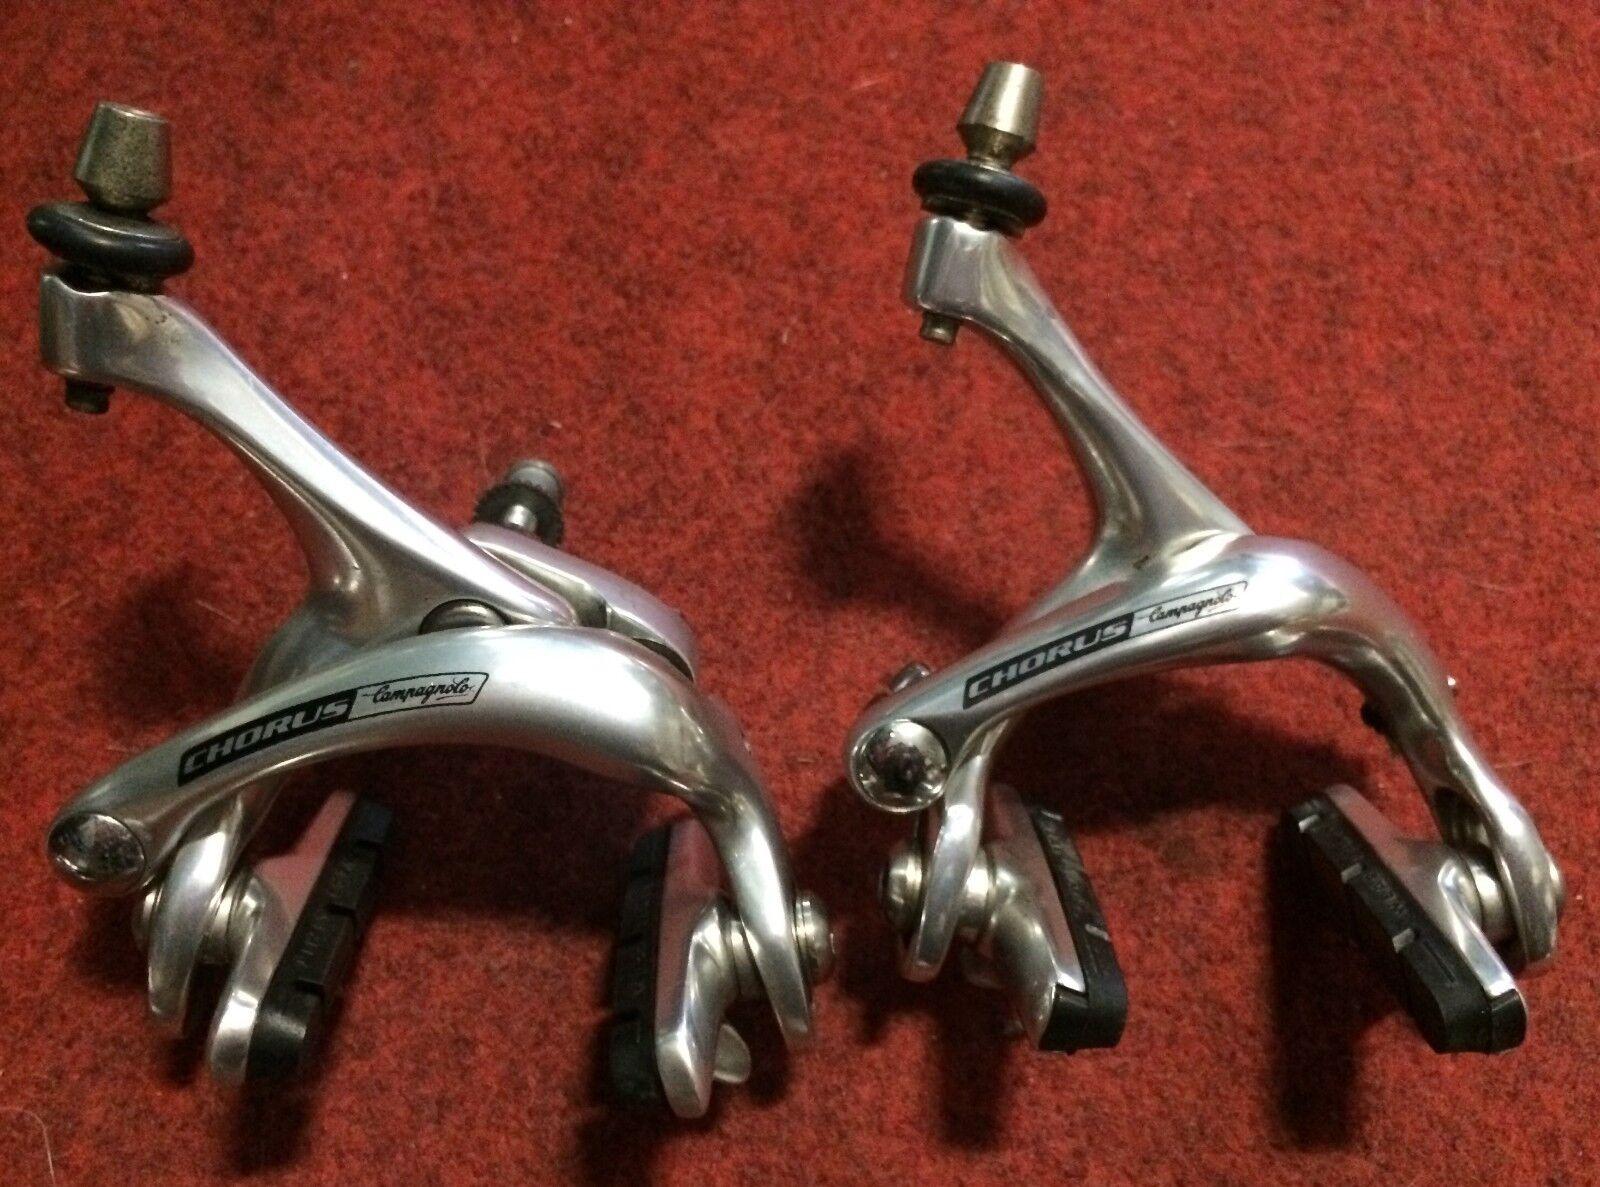 Coppia freni bici corsa Campagnolo Chorus road bike brake-set caliper